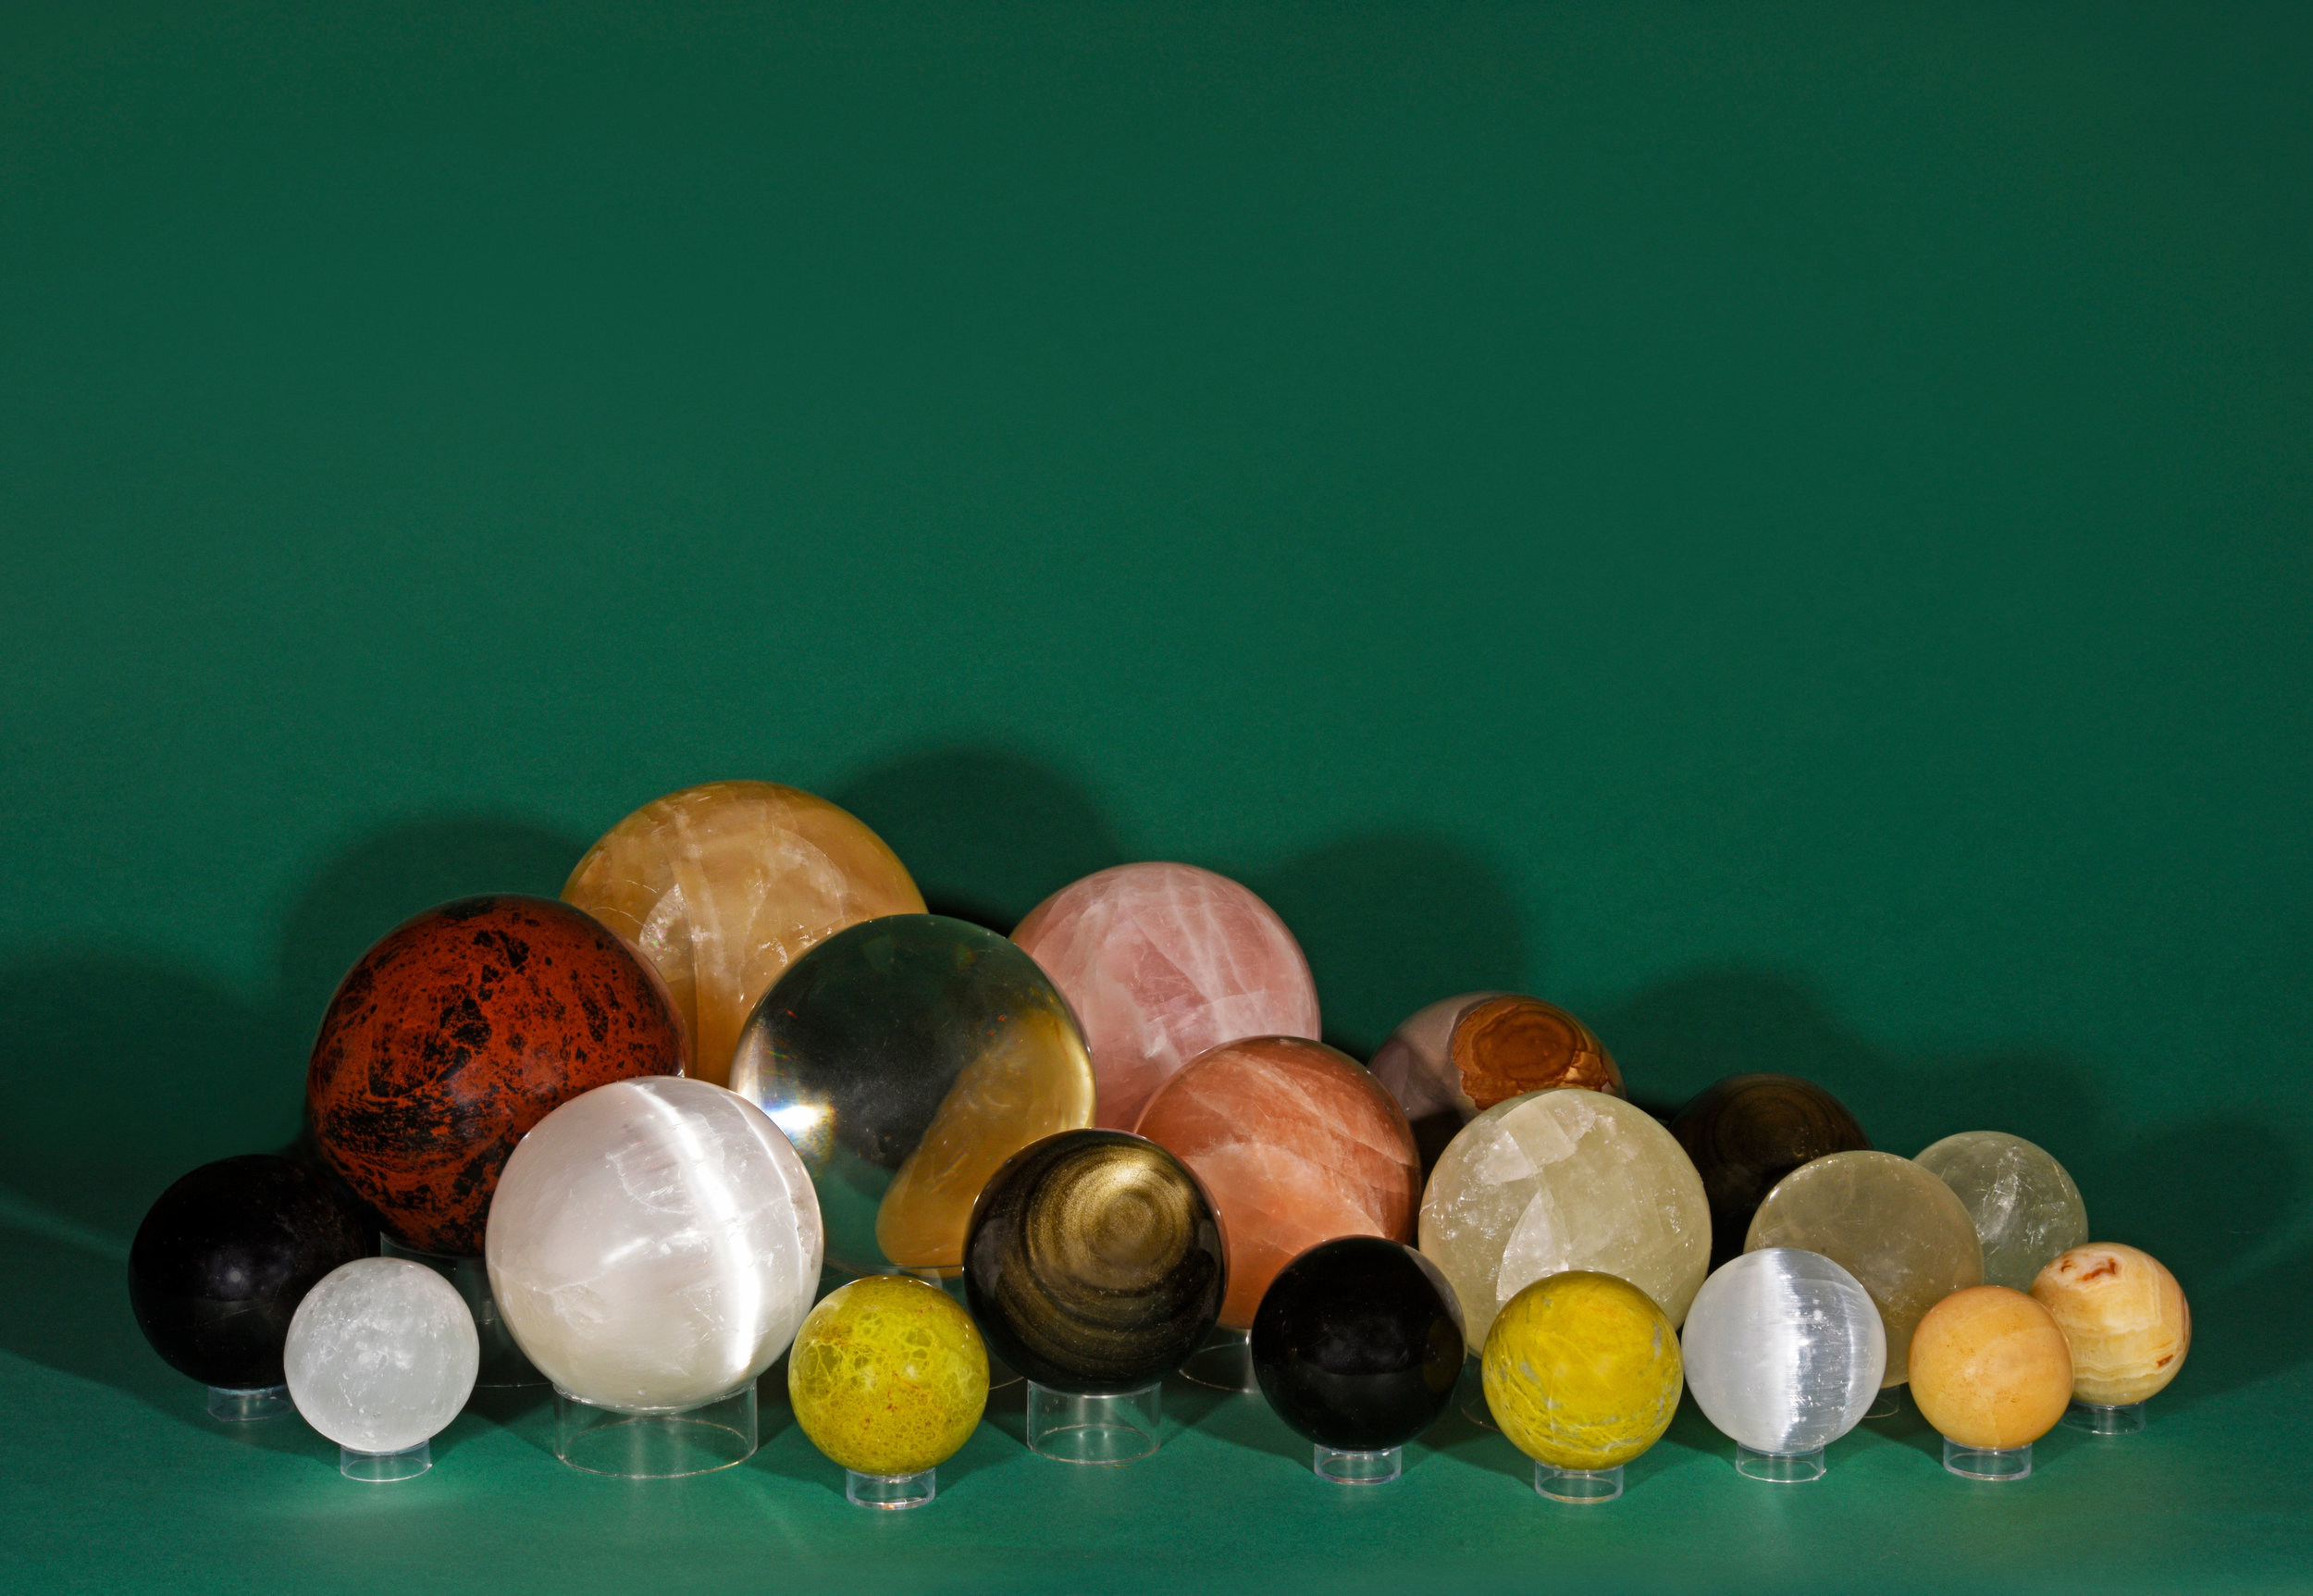 FLAUNT-MAGAZINE-CRYSTAL-BALLS-20TH-ANNIVERSARY.jpg